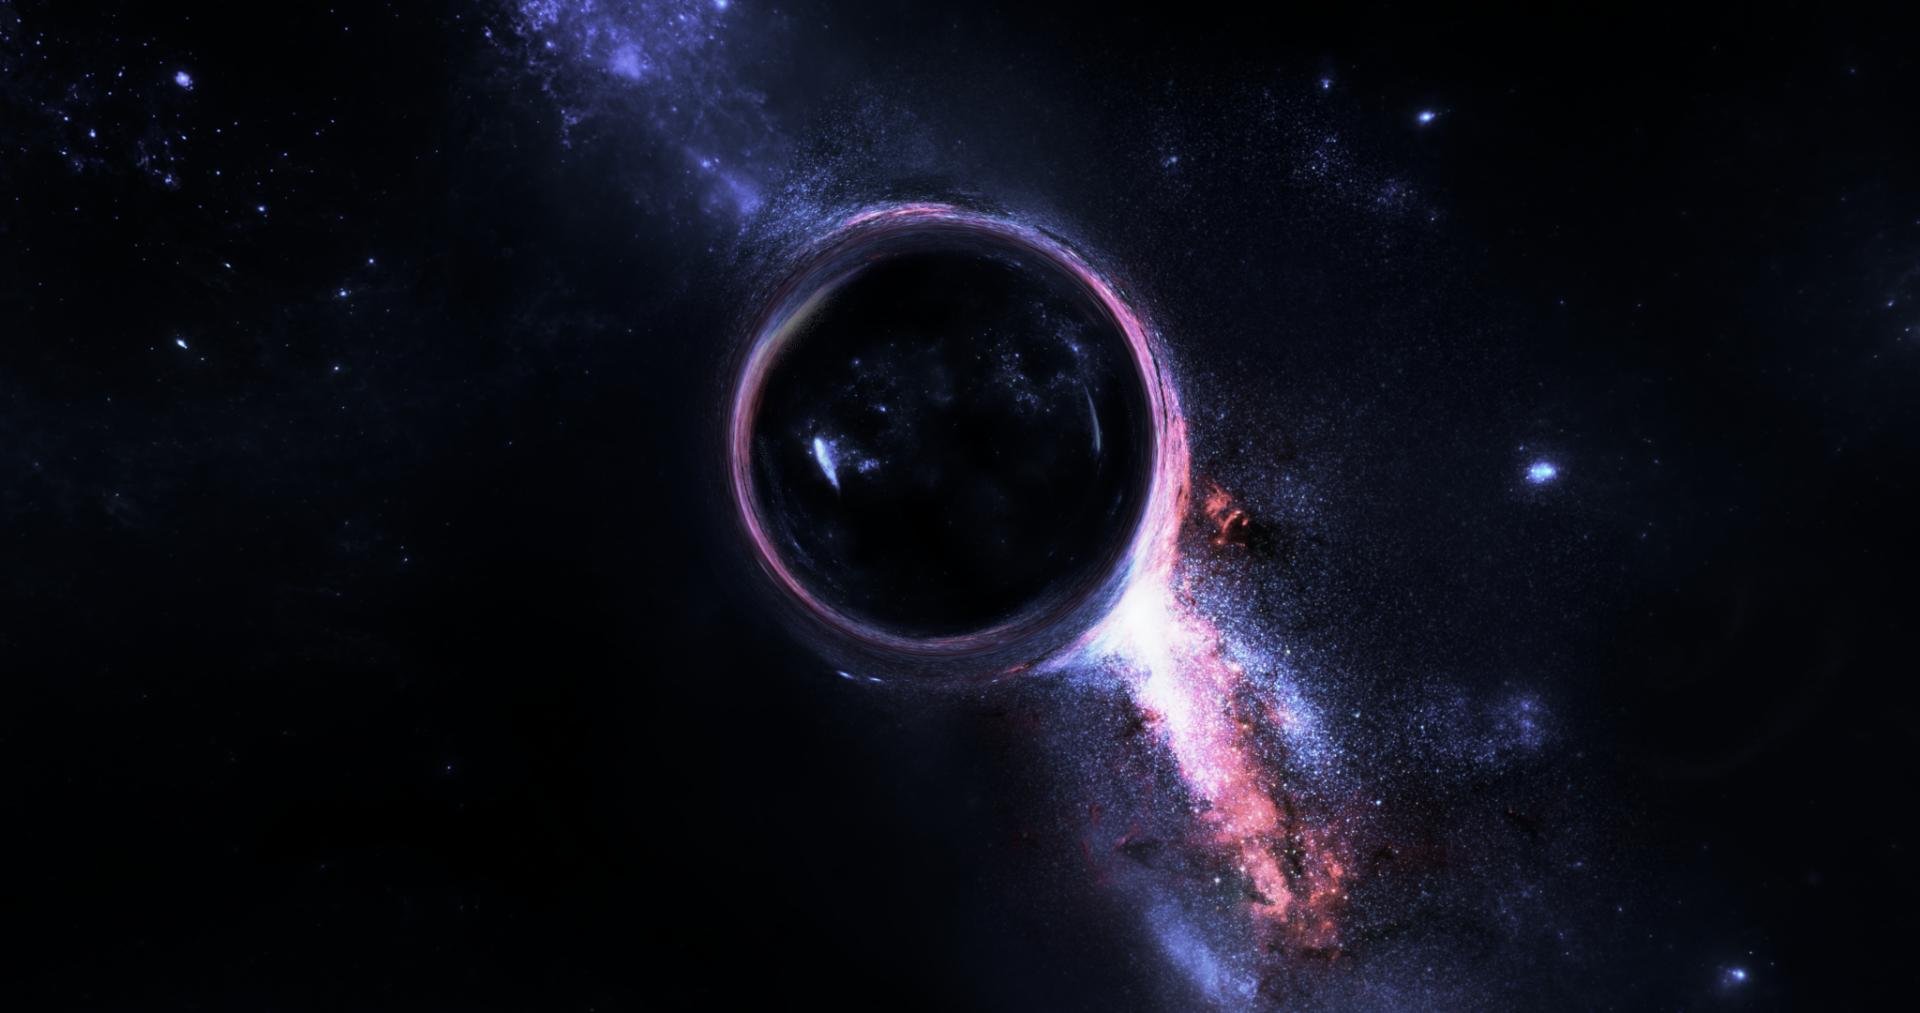 Black Hole HD Wallpaper | Background Image | 2048x1080 ...